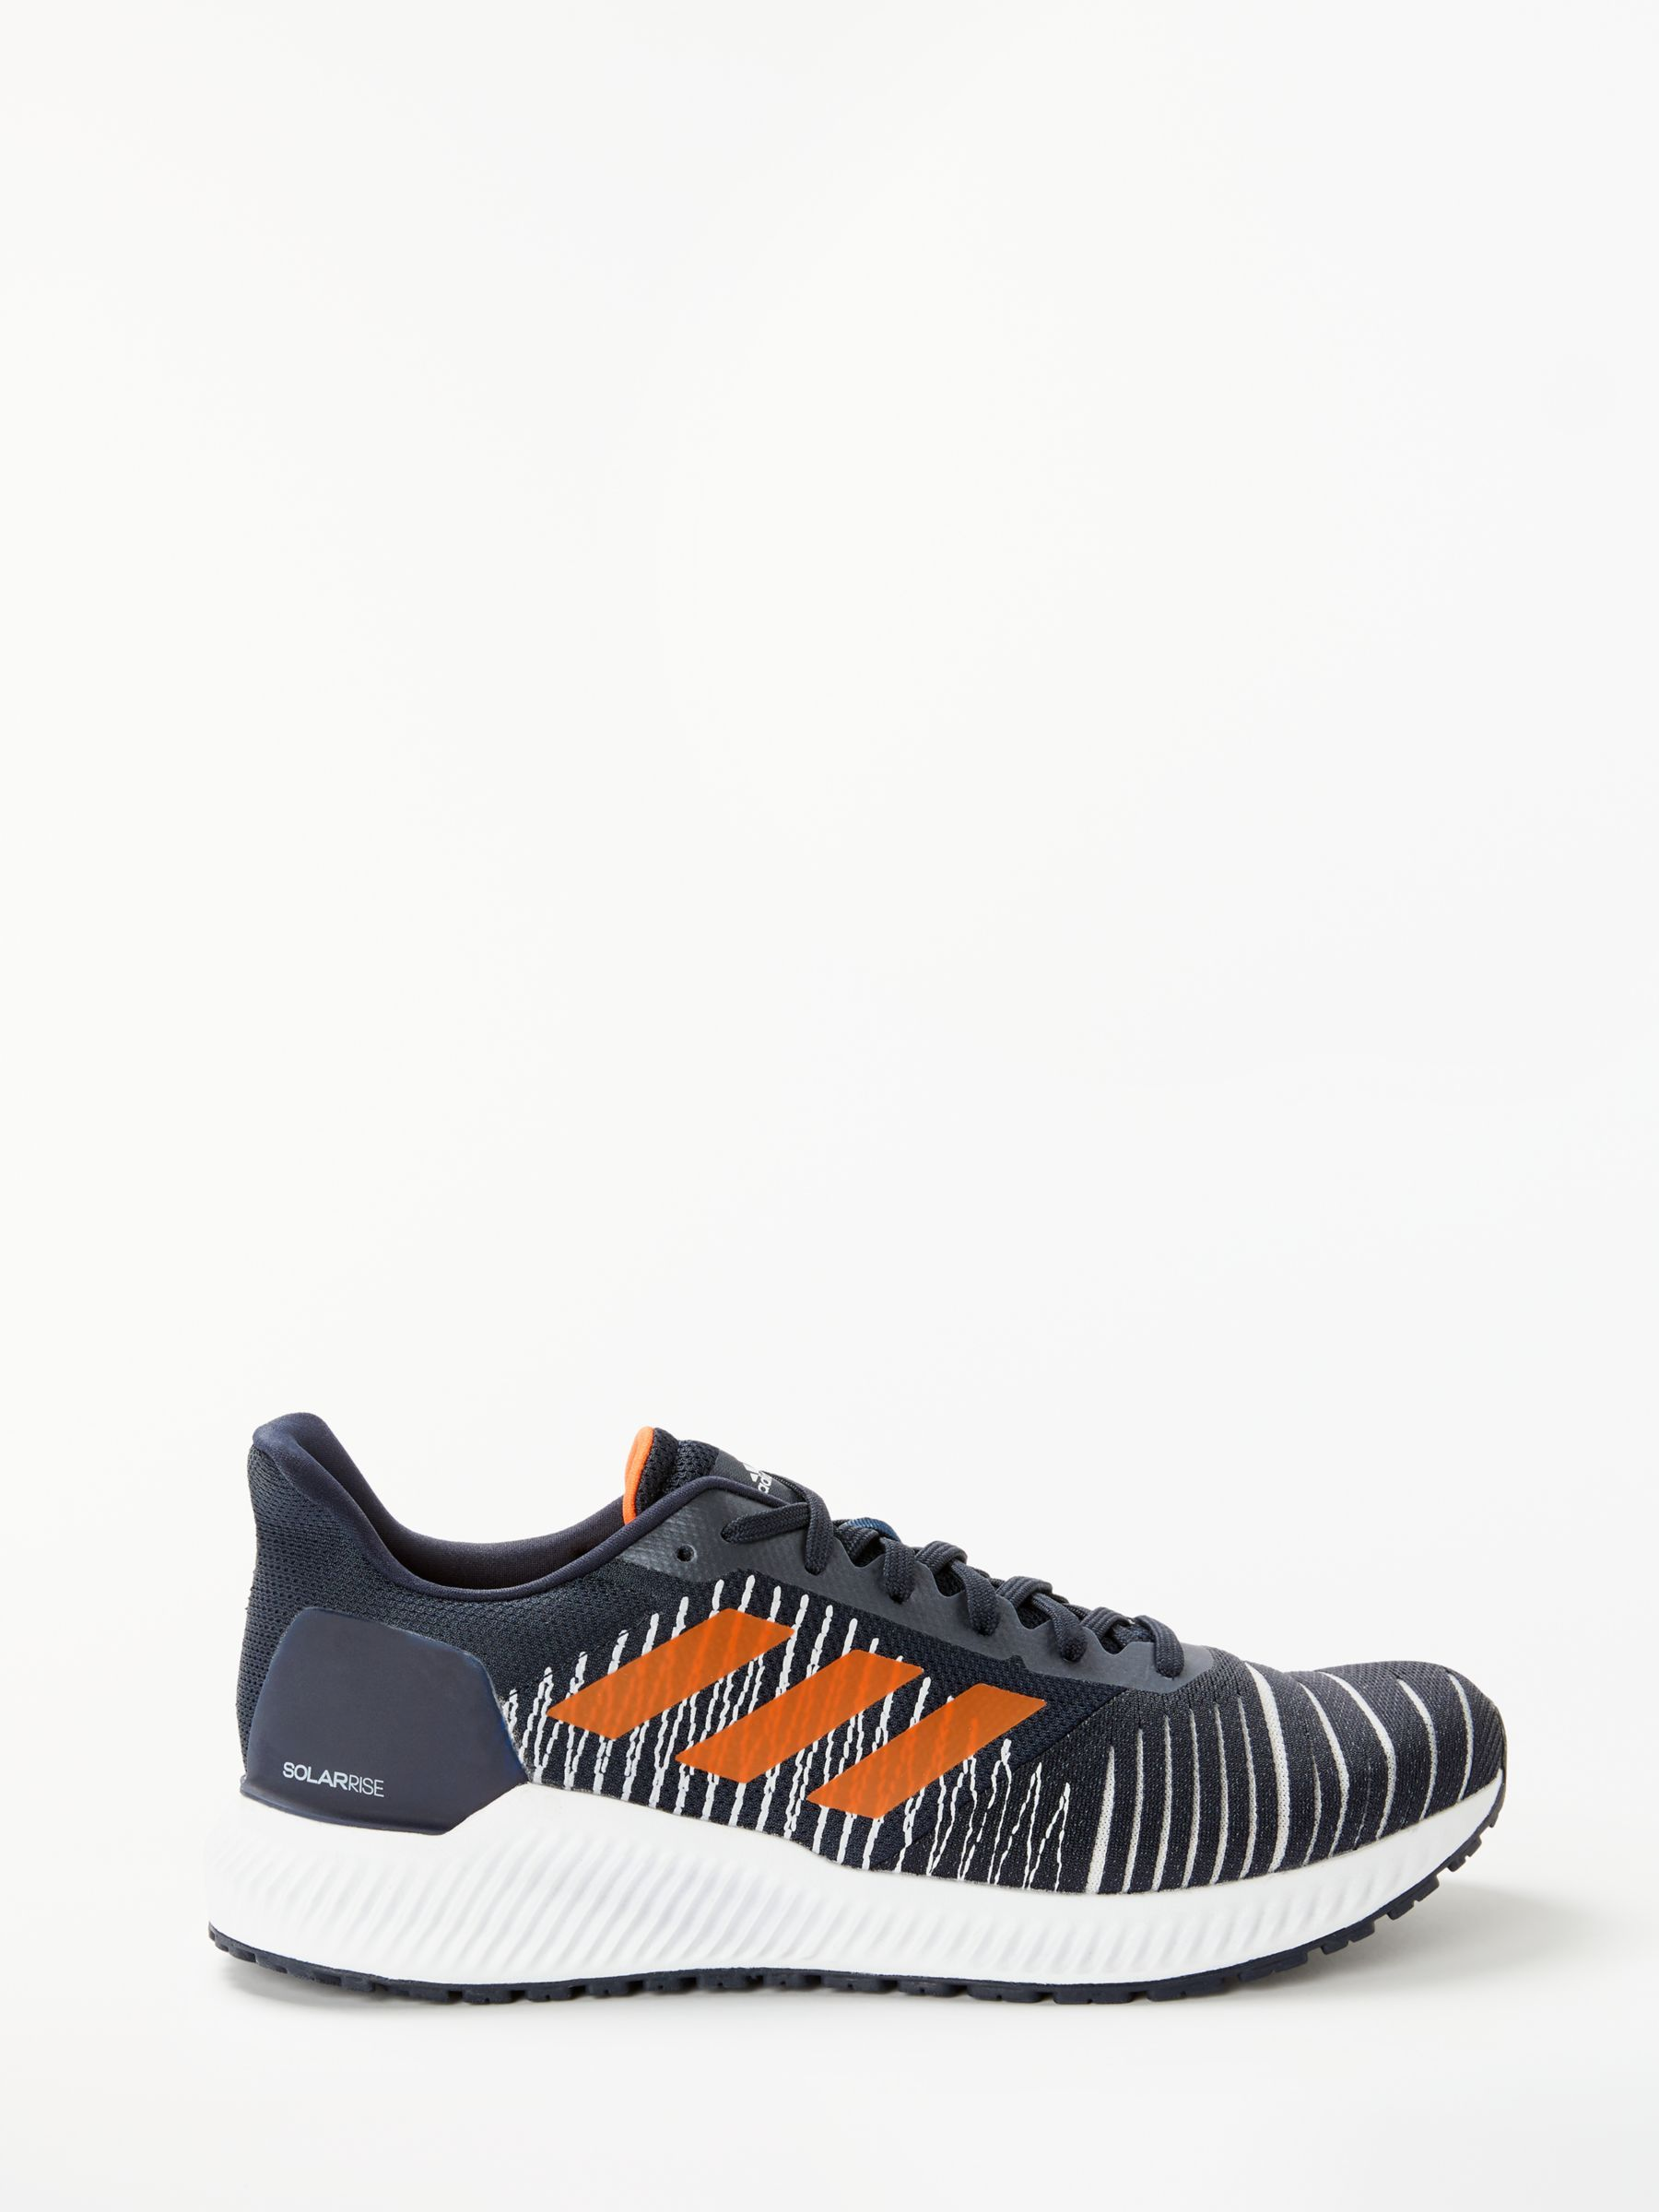 adidas Solar Ride Men's Running Shoes at John Lewis & Partners